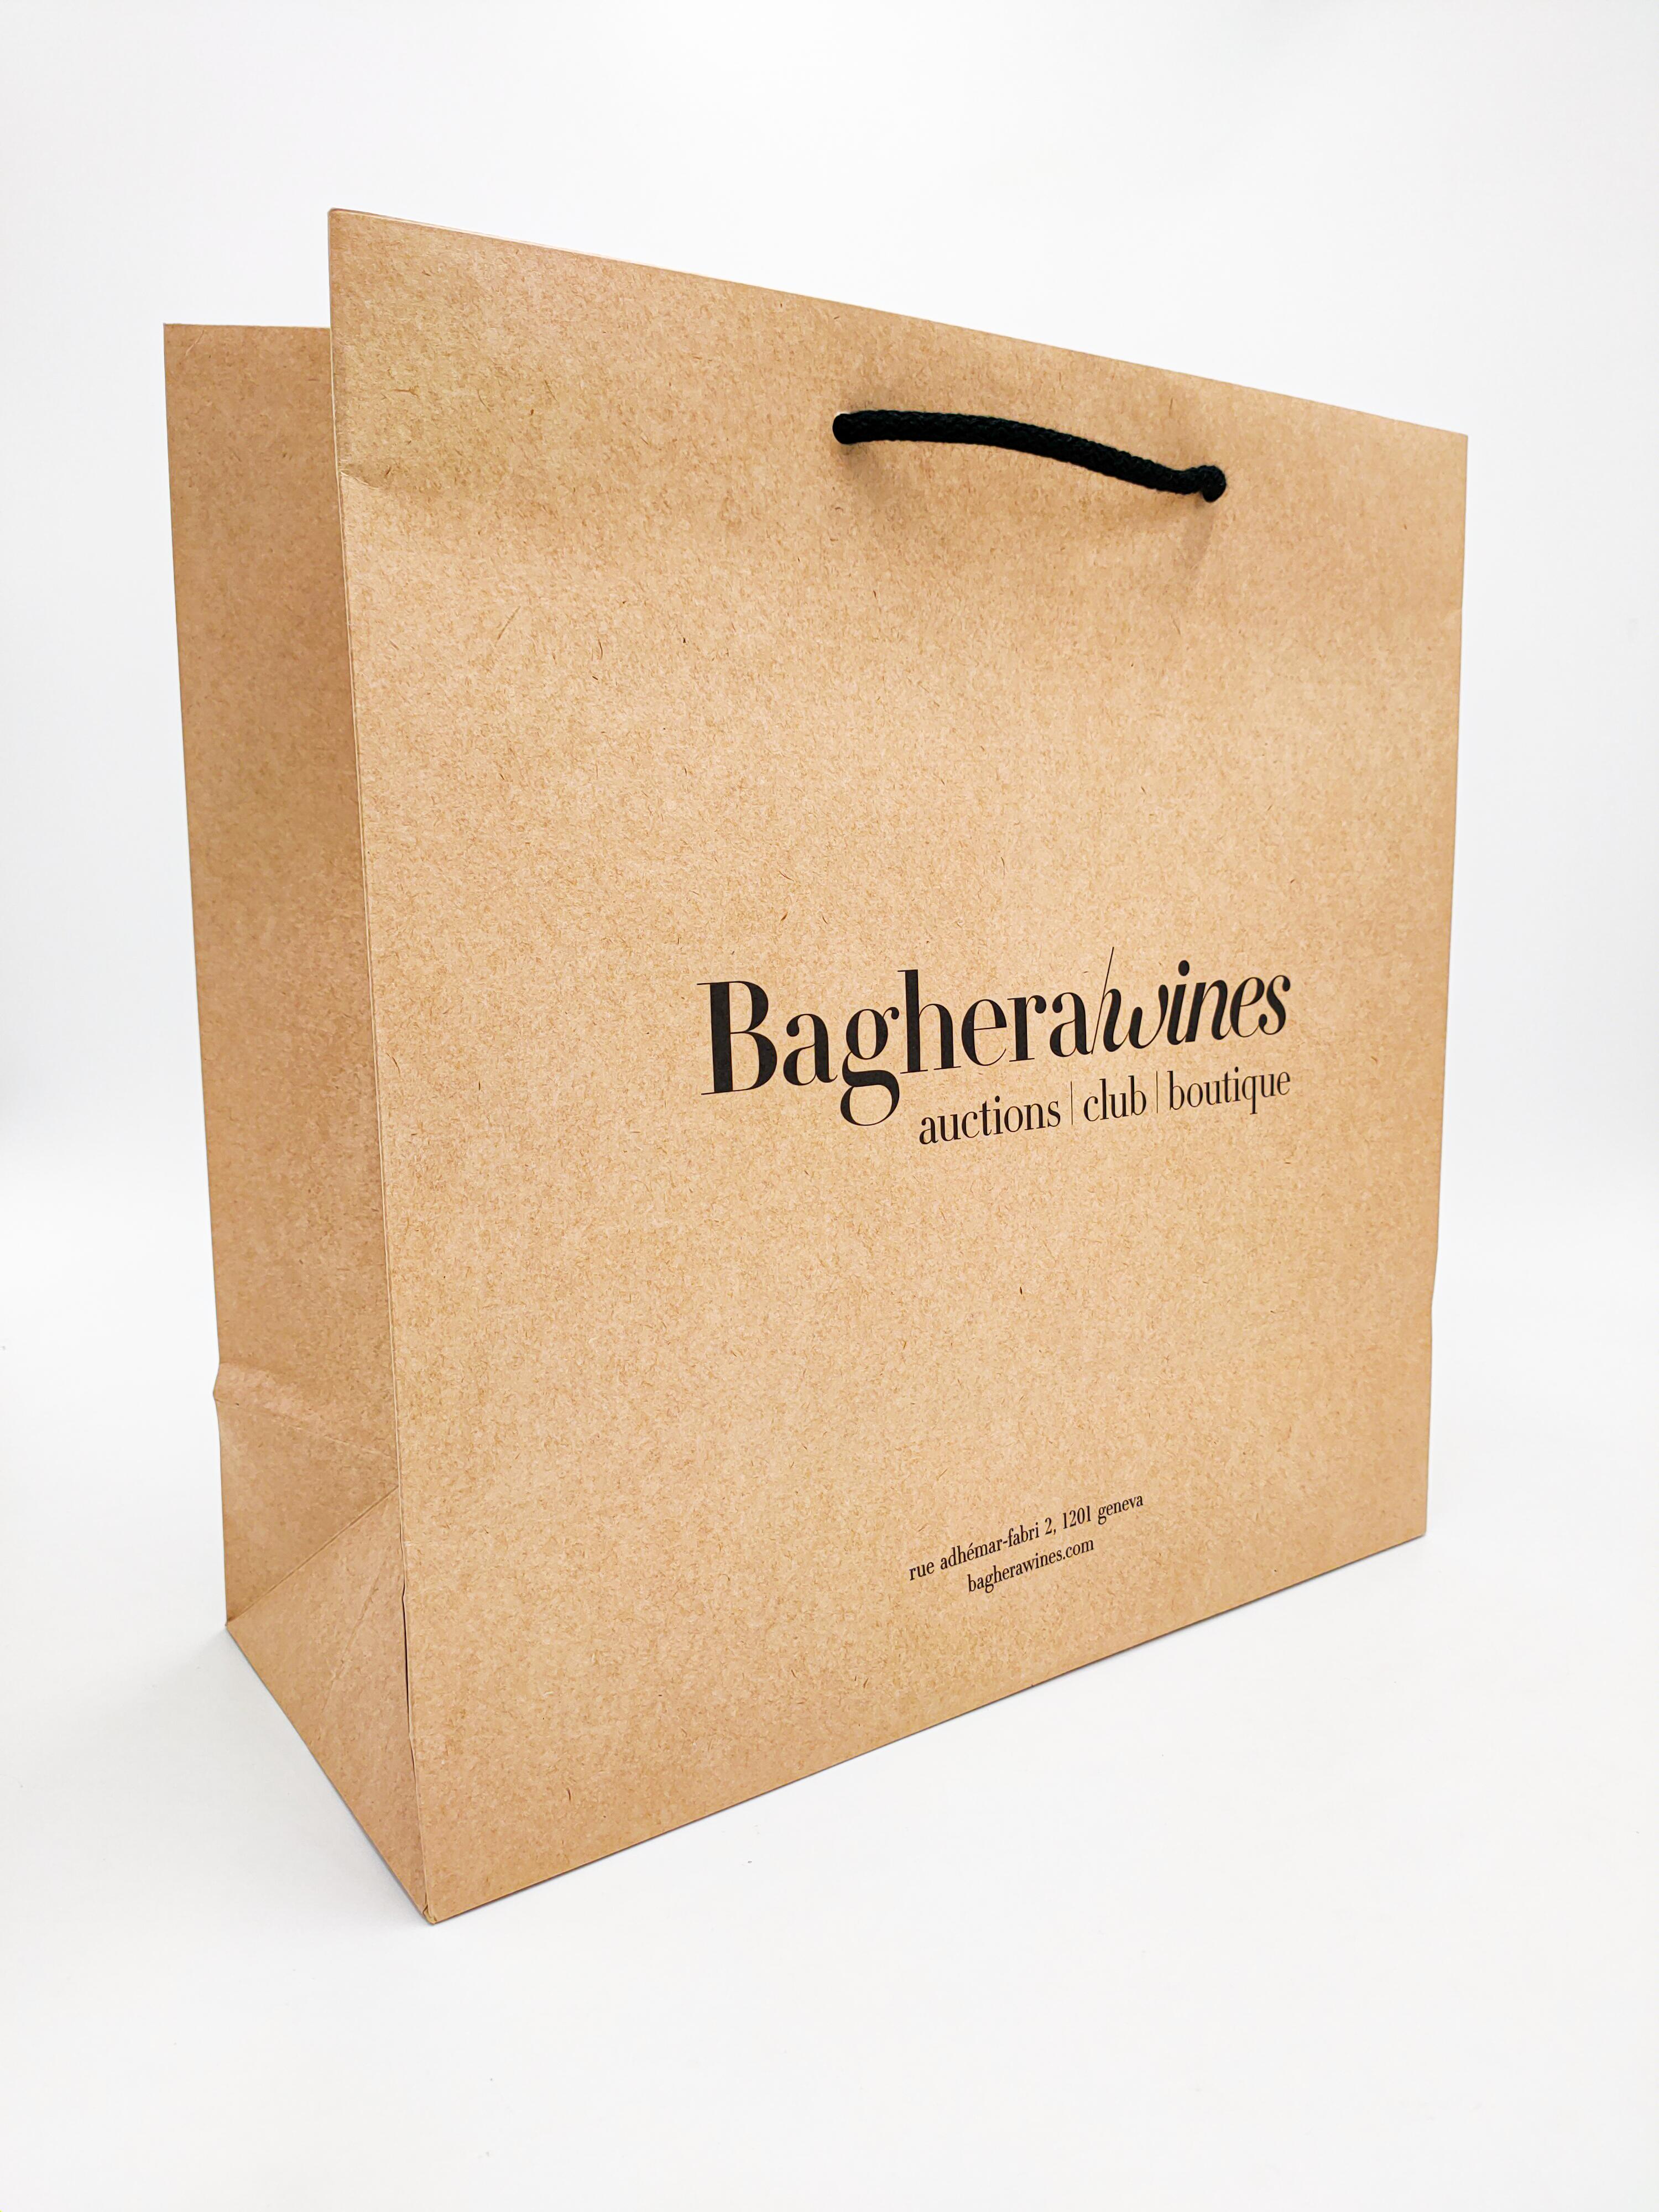 Sac en papier avec soufflet Baghera/wines - Sacs & Emballages